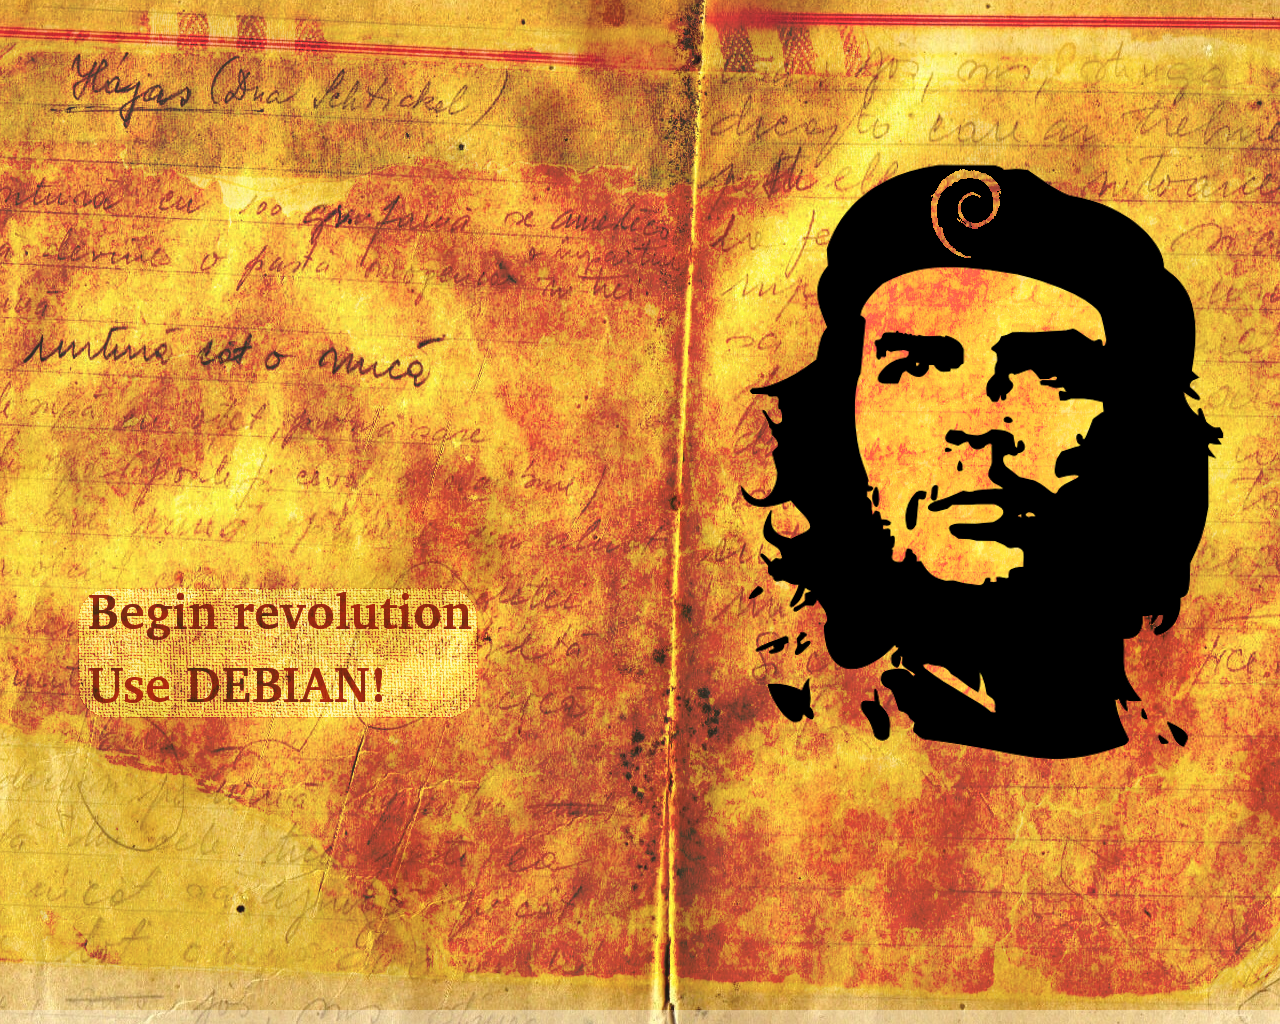 GNU revolution